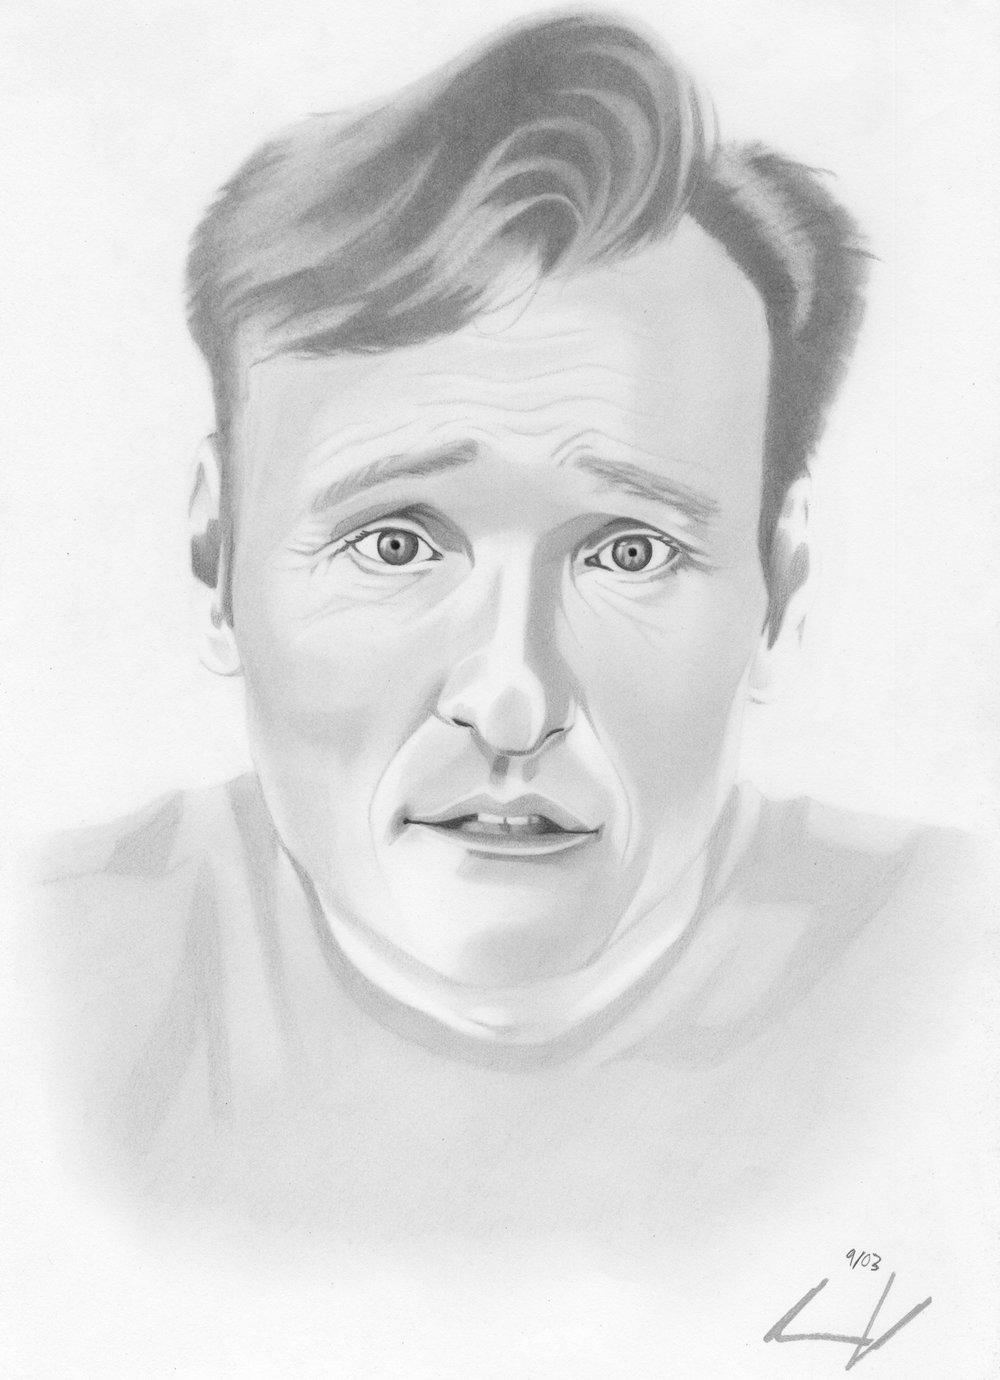 2003-09 Conan O'Brien.jpg